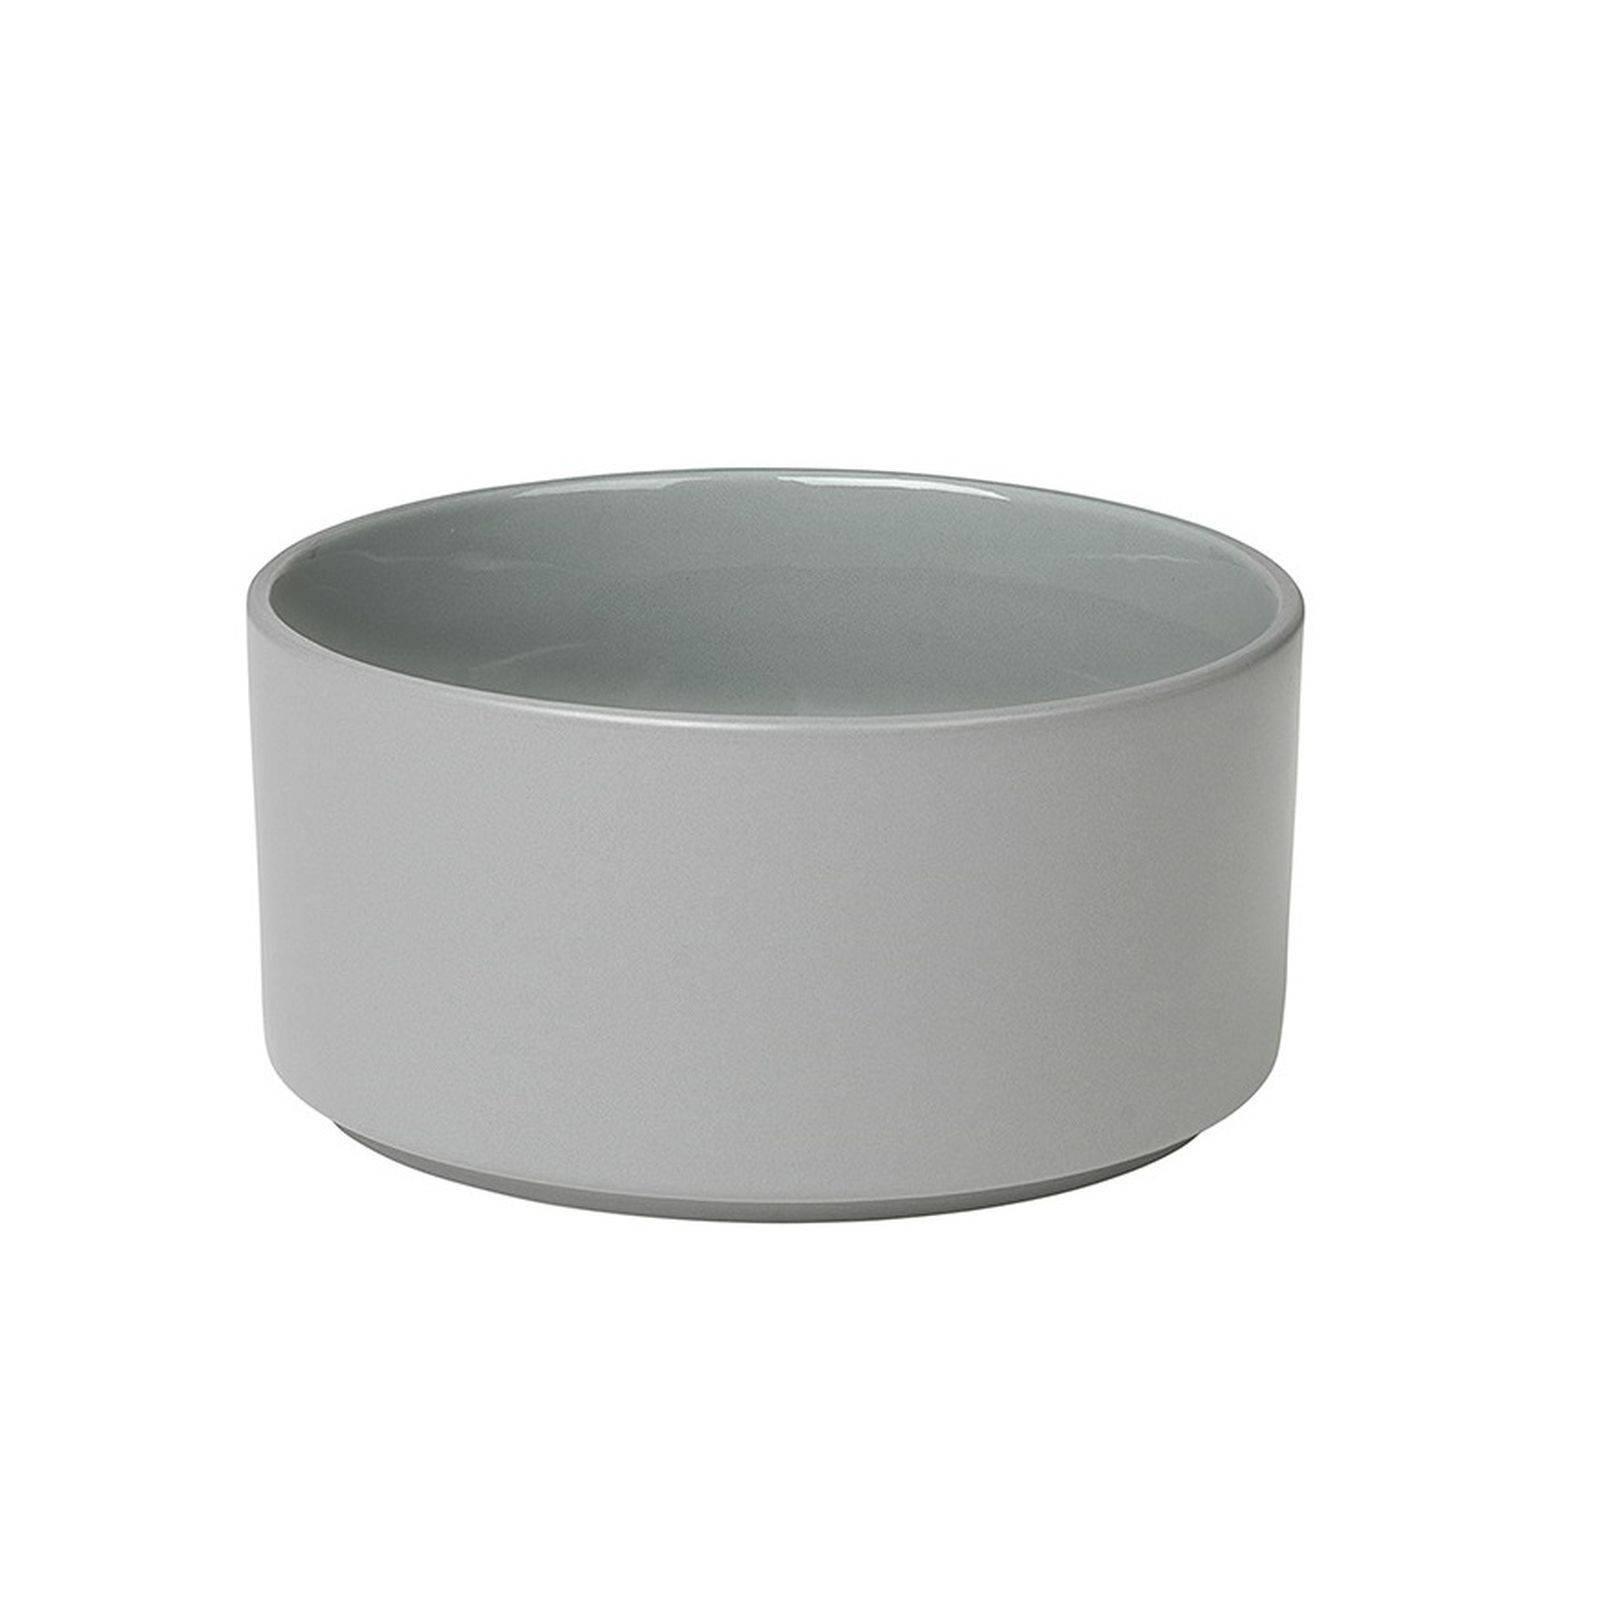 Blomus Soepkom Pilare Mirage Grey (Ø14 cm) online kopen